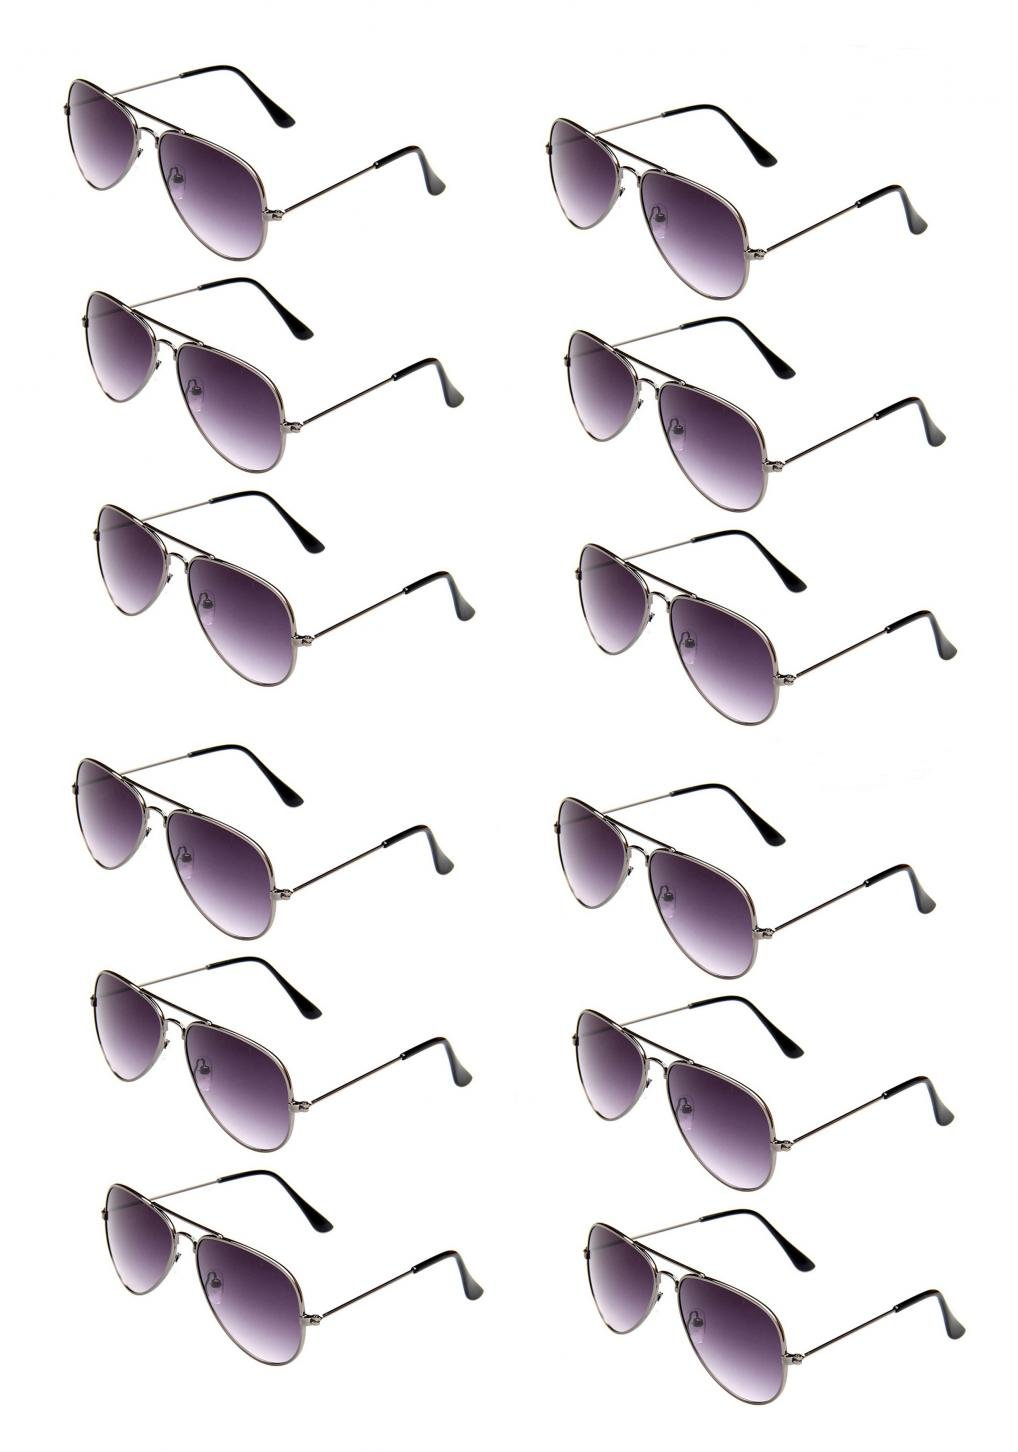 WODISON Classic Kids Aviator Sunglasses Bulk Metal Frame Children Party Eyeglasses 12 Packs by WODISON